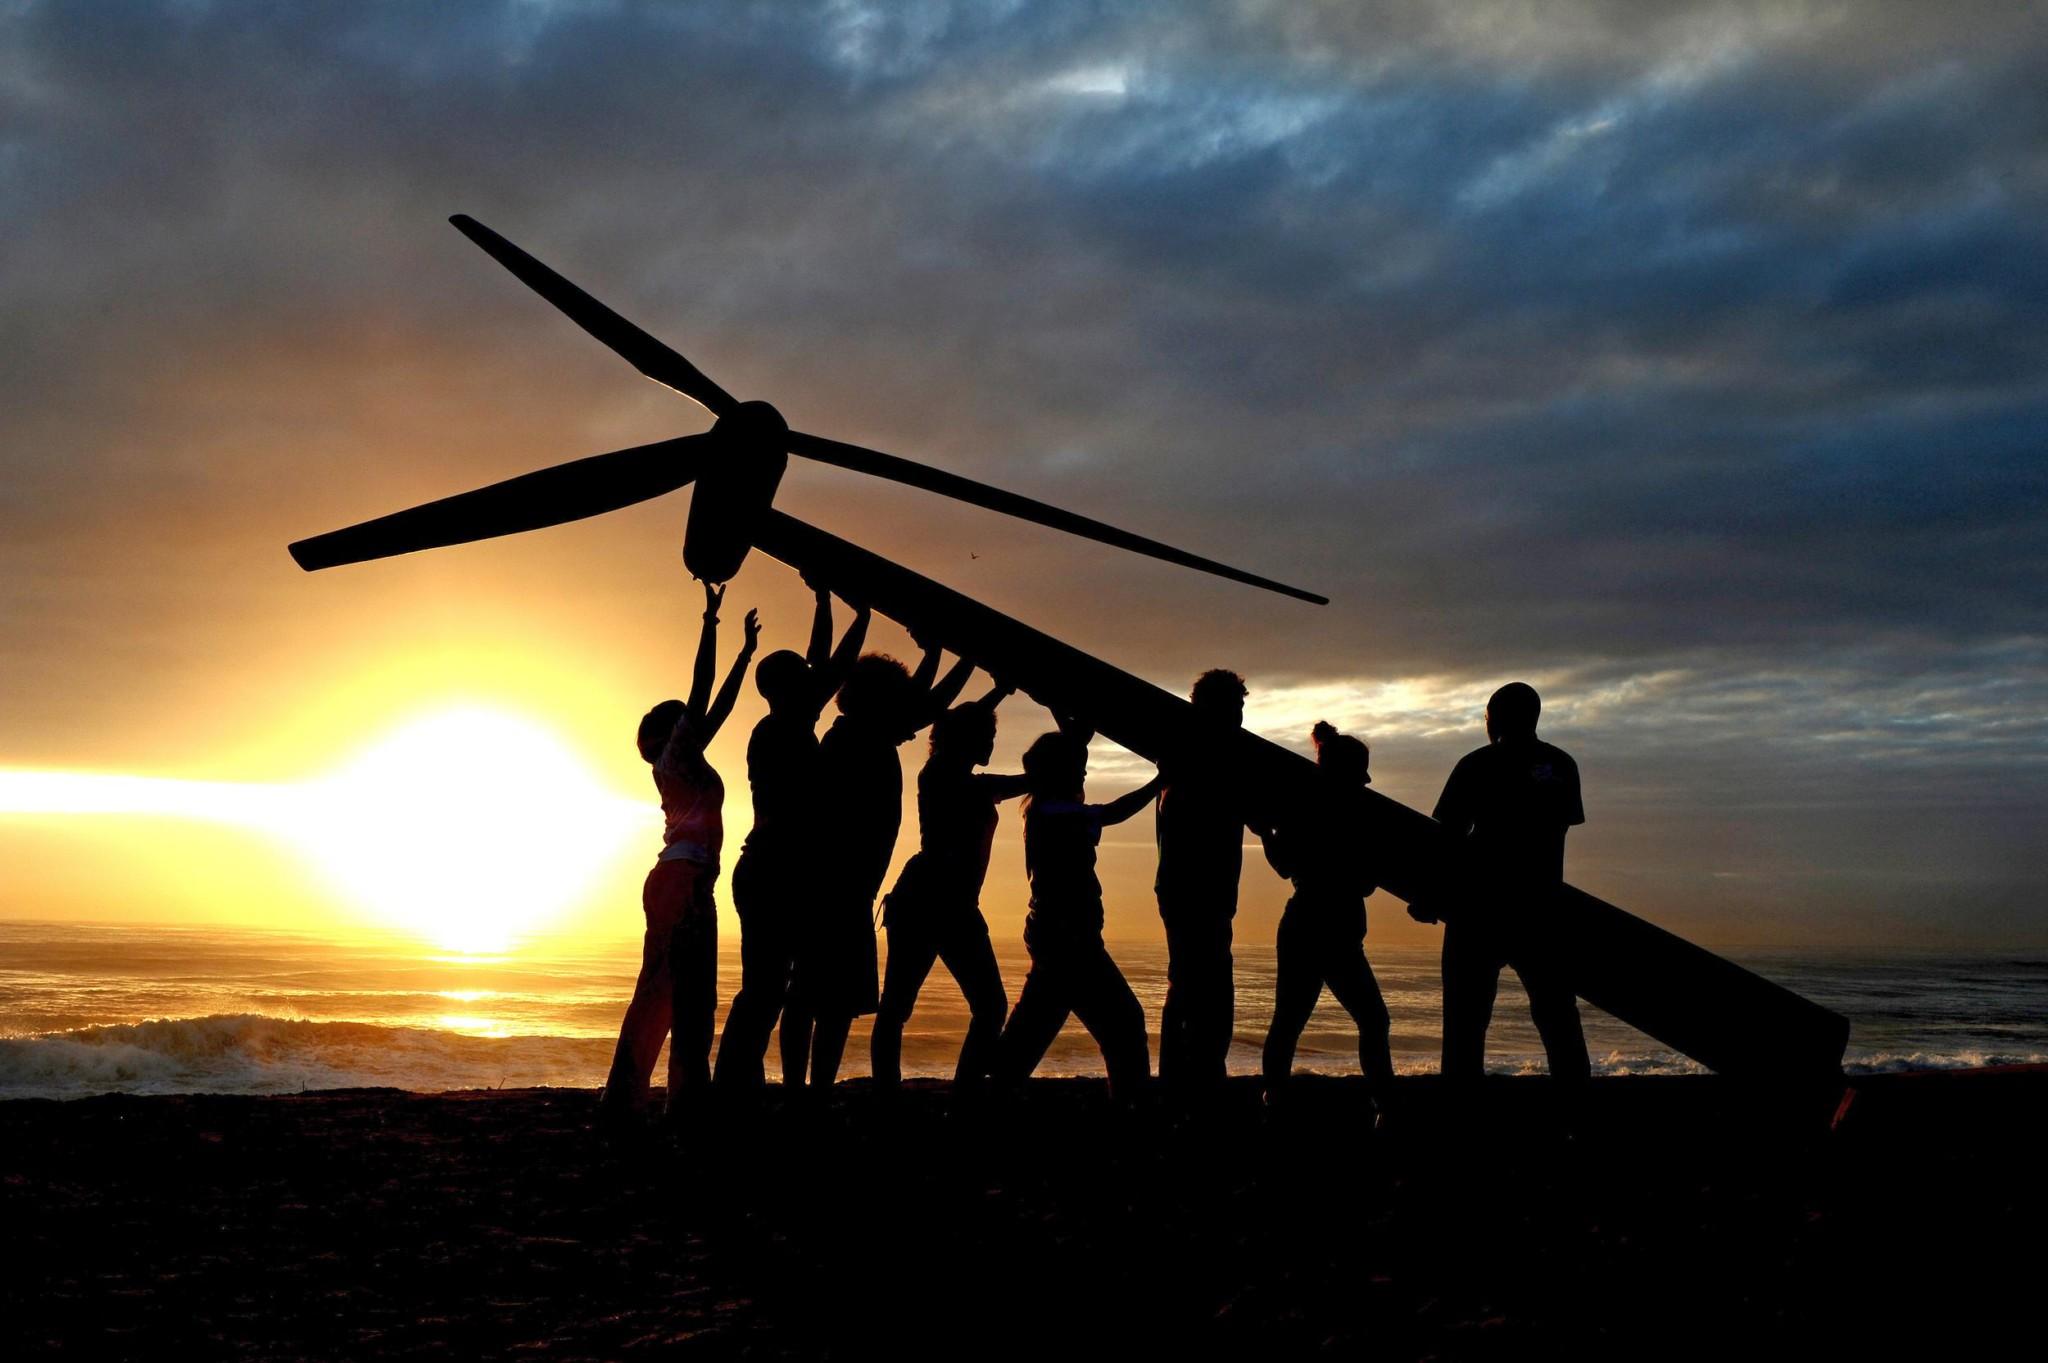 Raising a Wind Turbine in Durban. © Shayne Robinson / Greenpeace